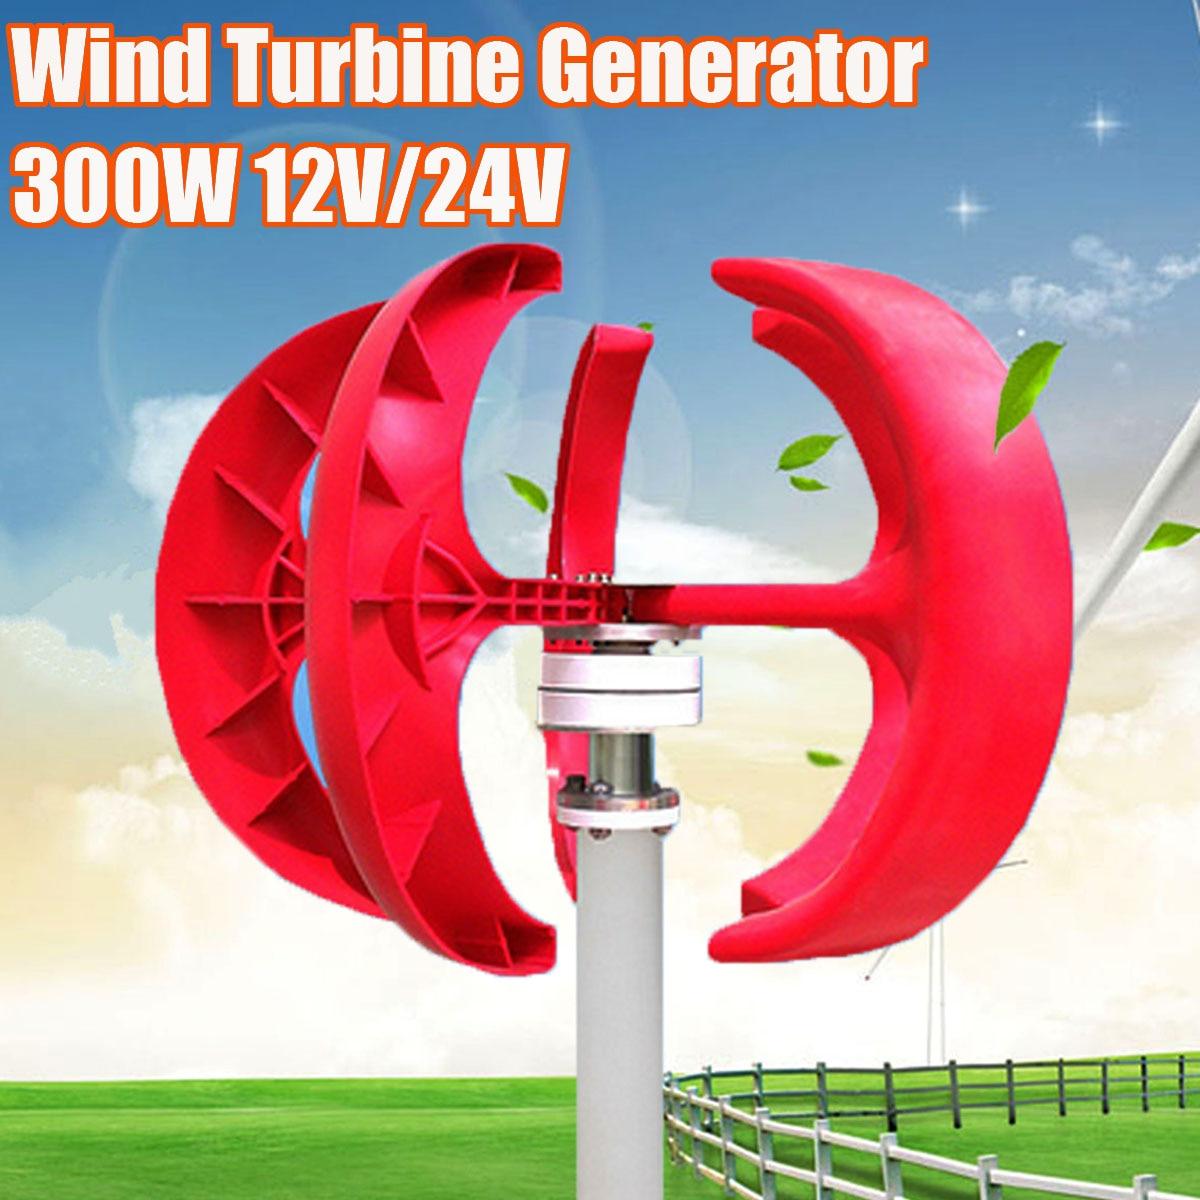 цена на 5 Blades 300W 12V/24V Wind Turbine Generator Power Vertical Axis Red Lantern Energy Fiber 3 Phase AC Permanent Magnet Generator